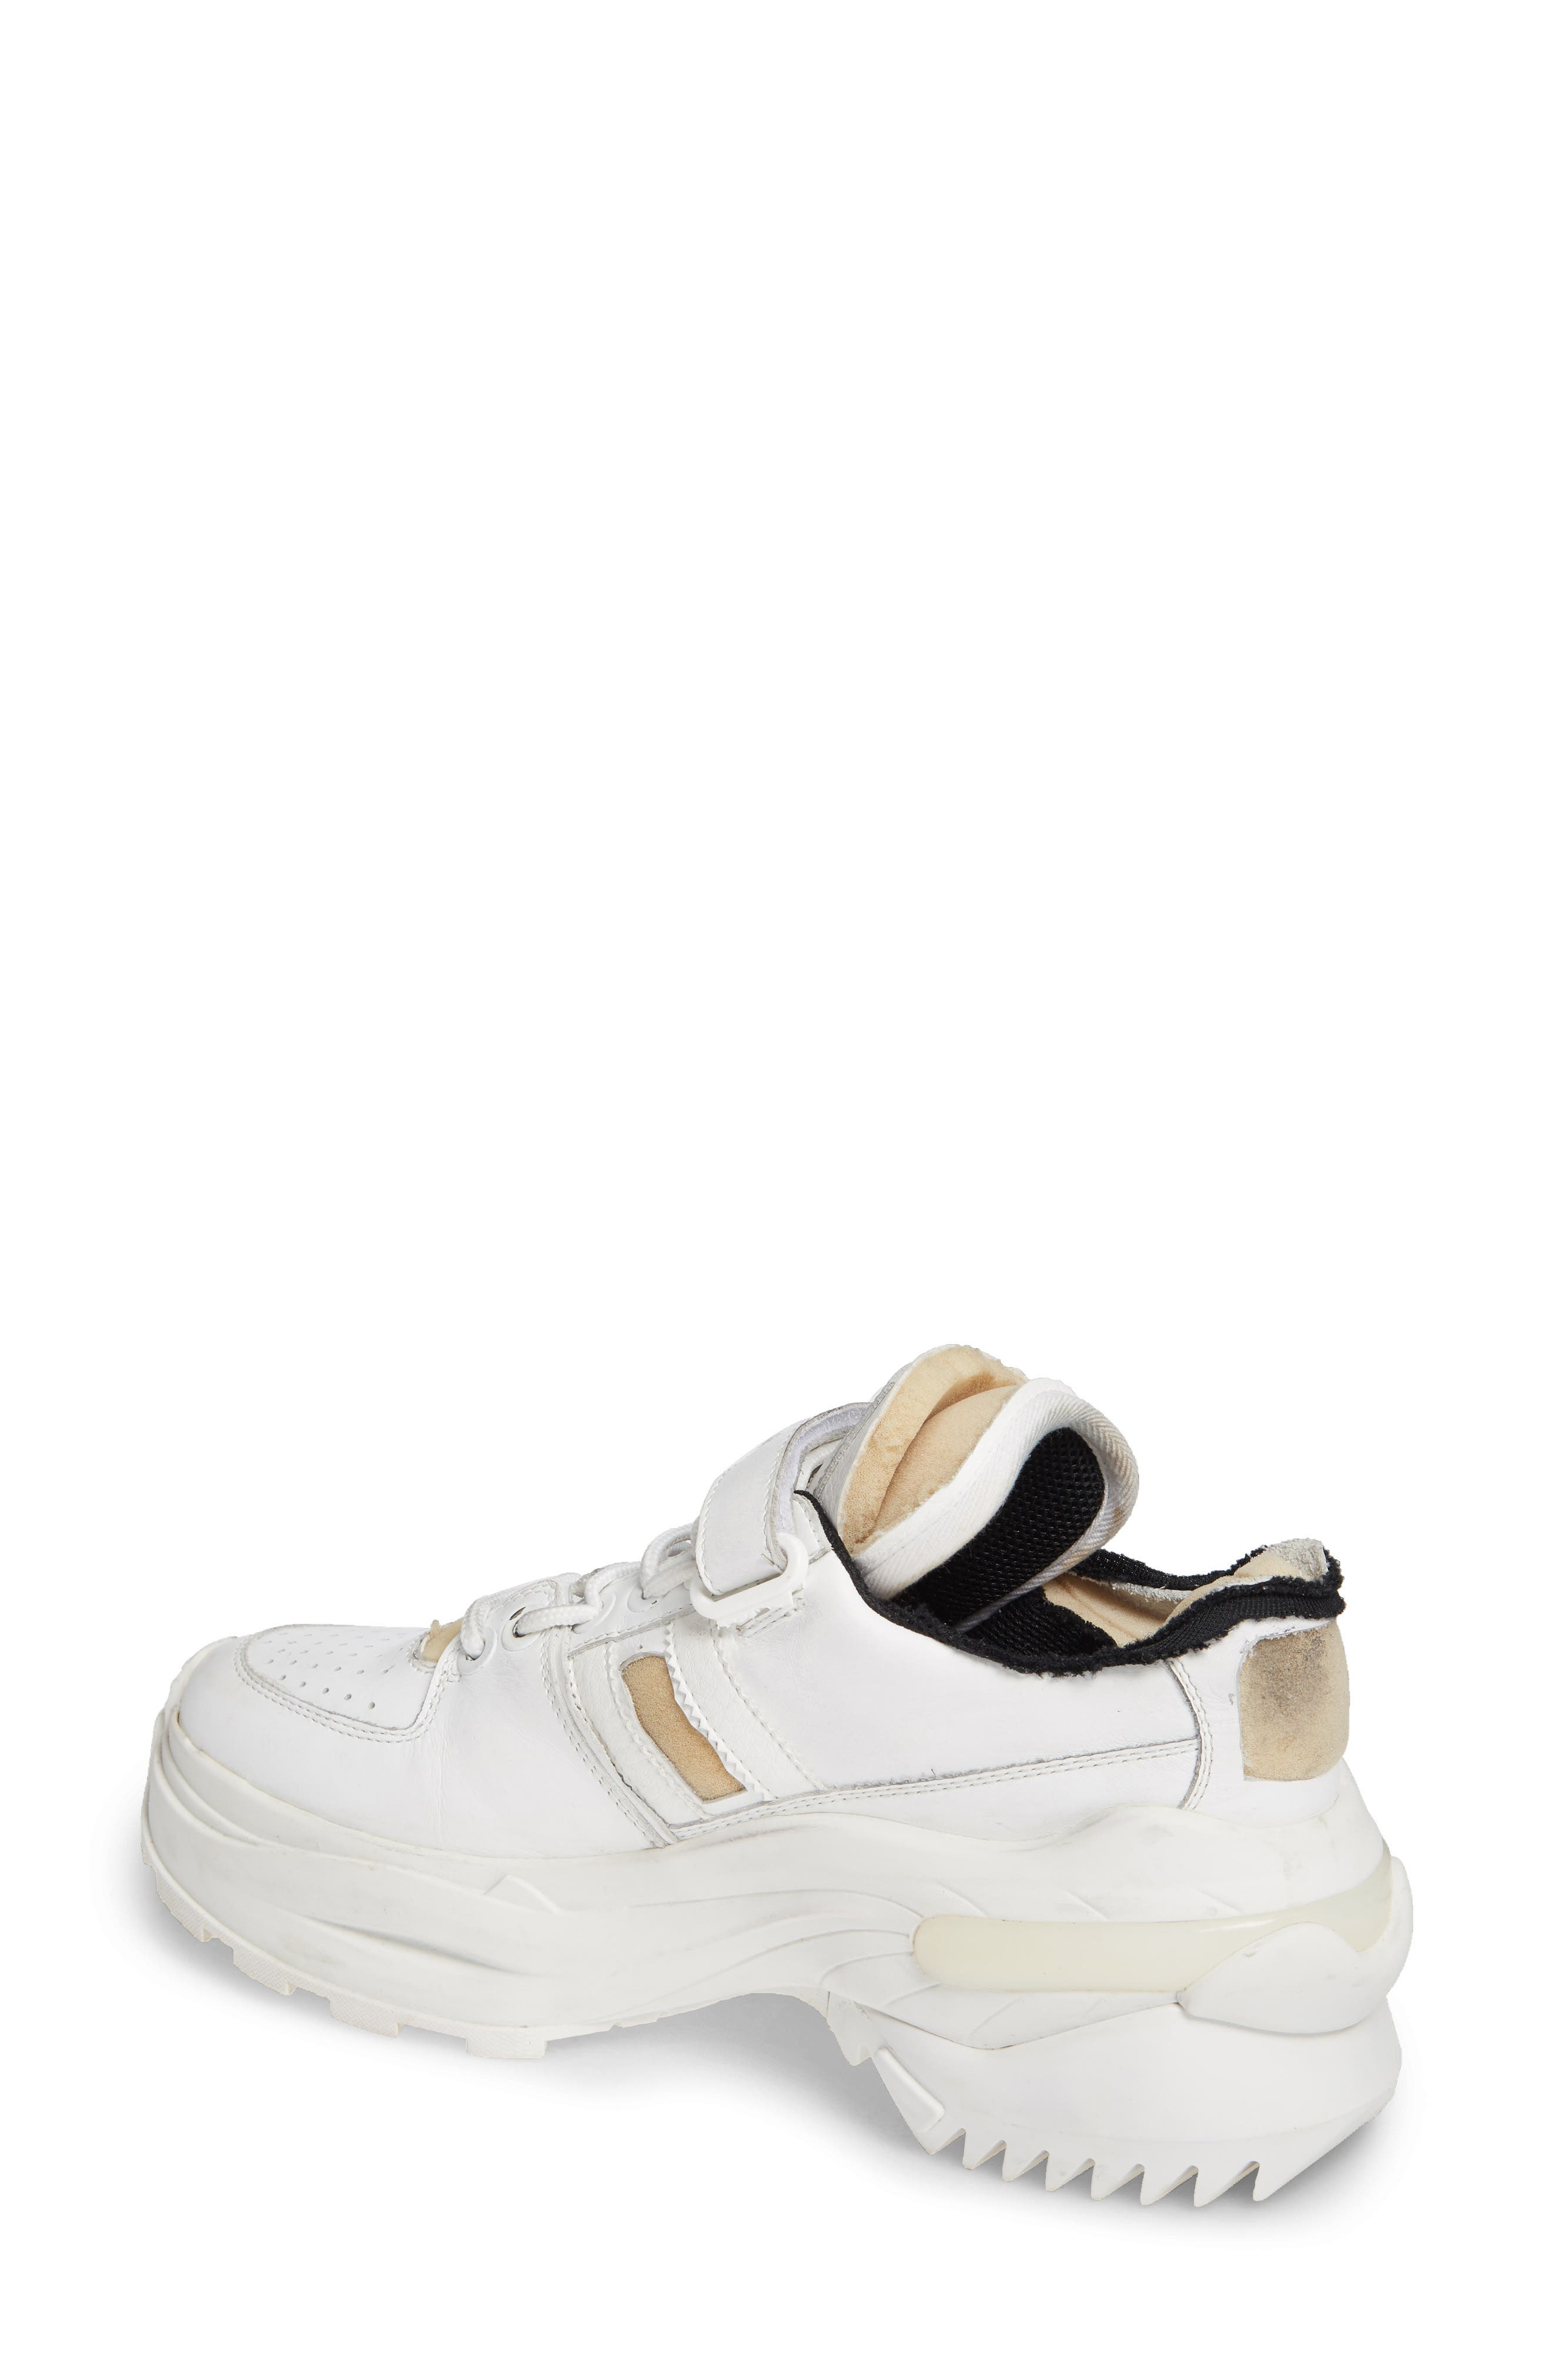 MAISON MARGIELA, Retro Fit Destroyed Sneaker, Alternate thumbnail 2, color, WHITE